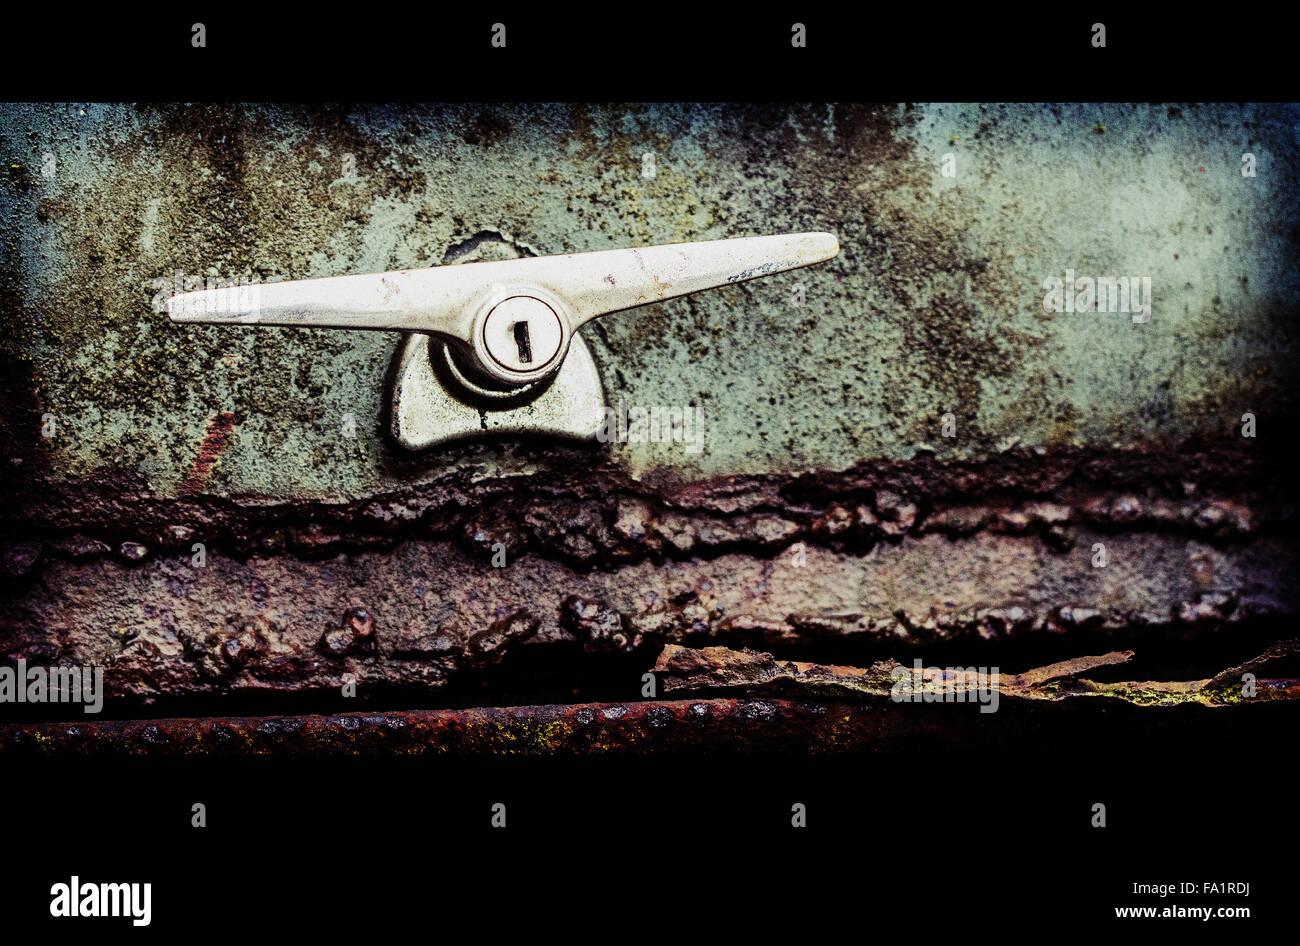 Rusty Car Boot of a Morris Minor Car - Stock Image